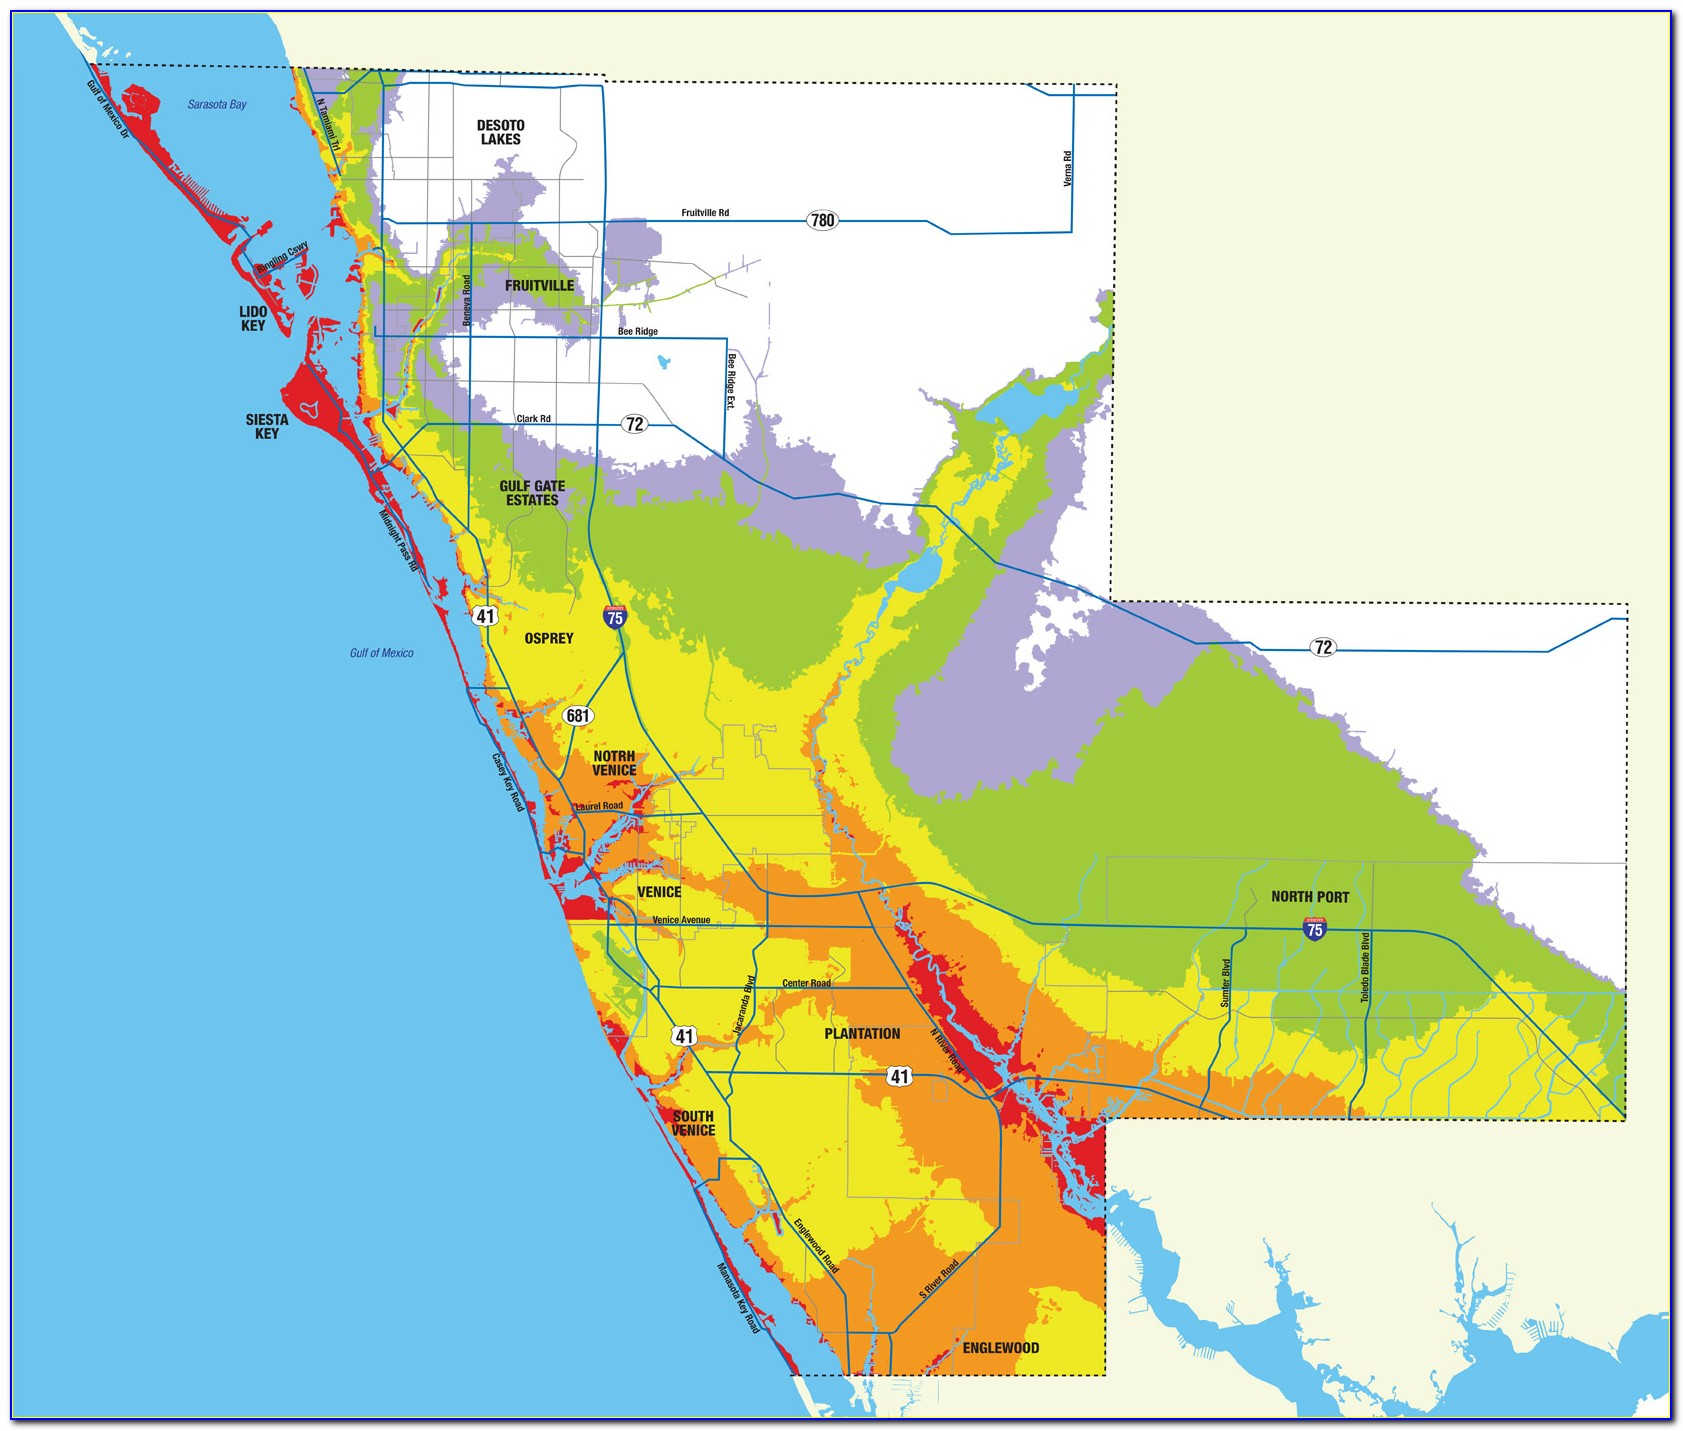 Florida Flood Zone Map Miami Dade